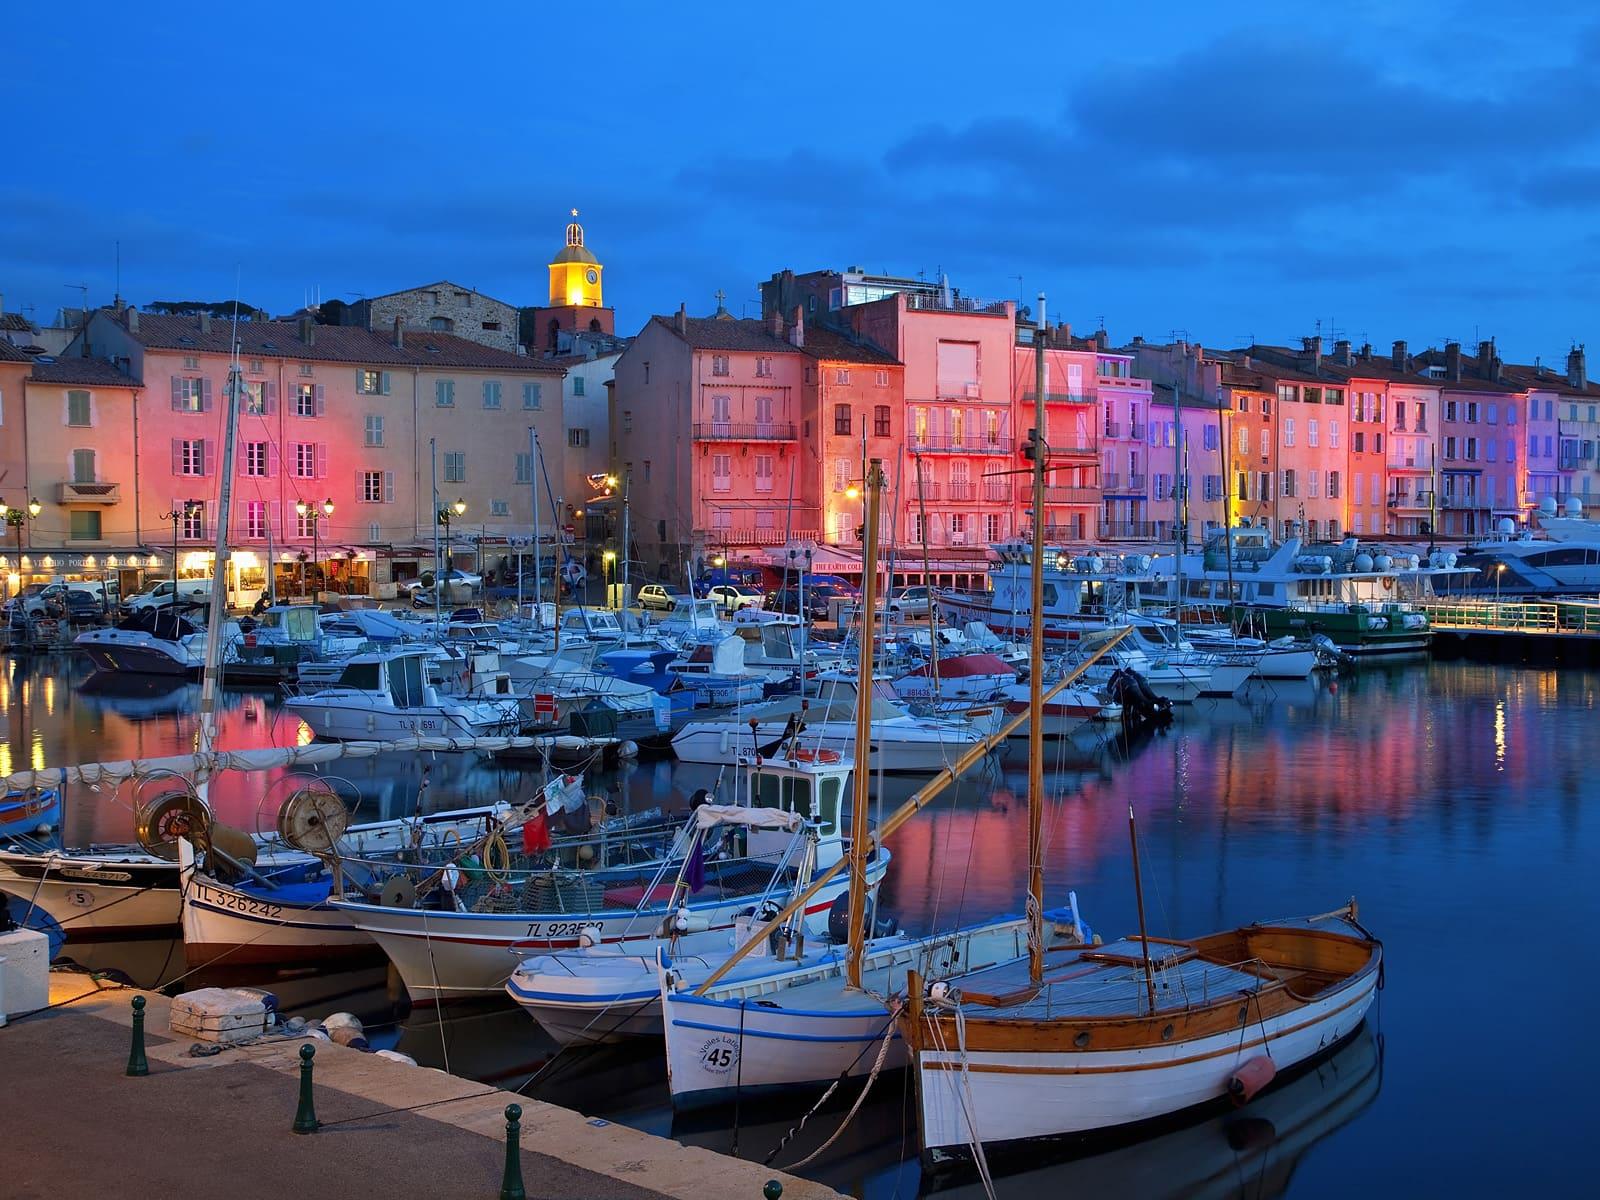 Boats in marina at twilight, St.-Tropez, France